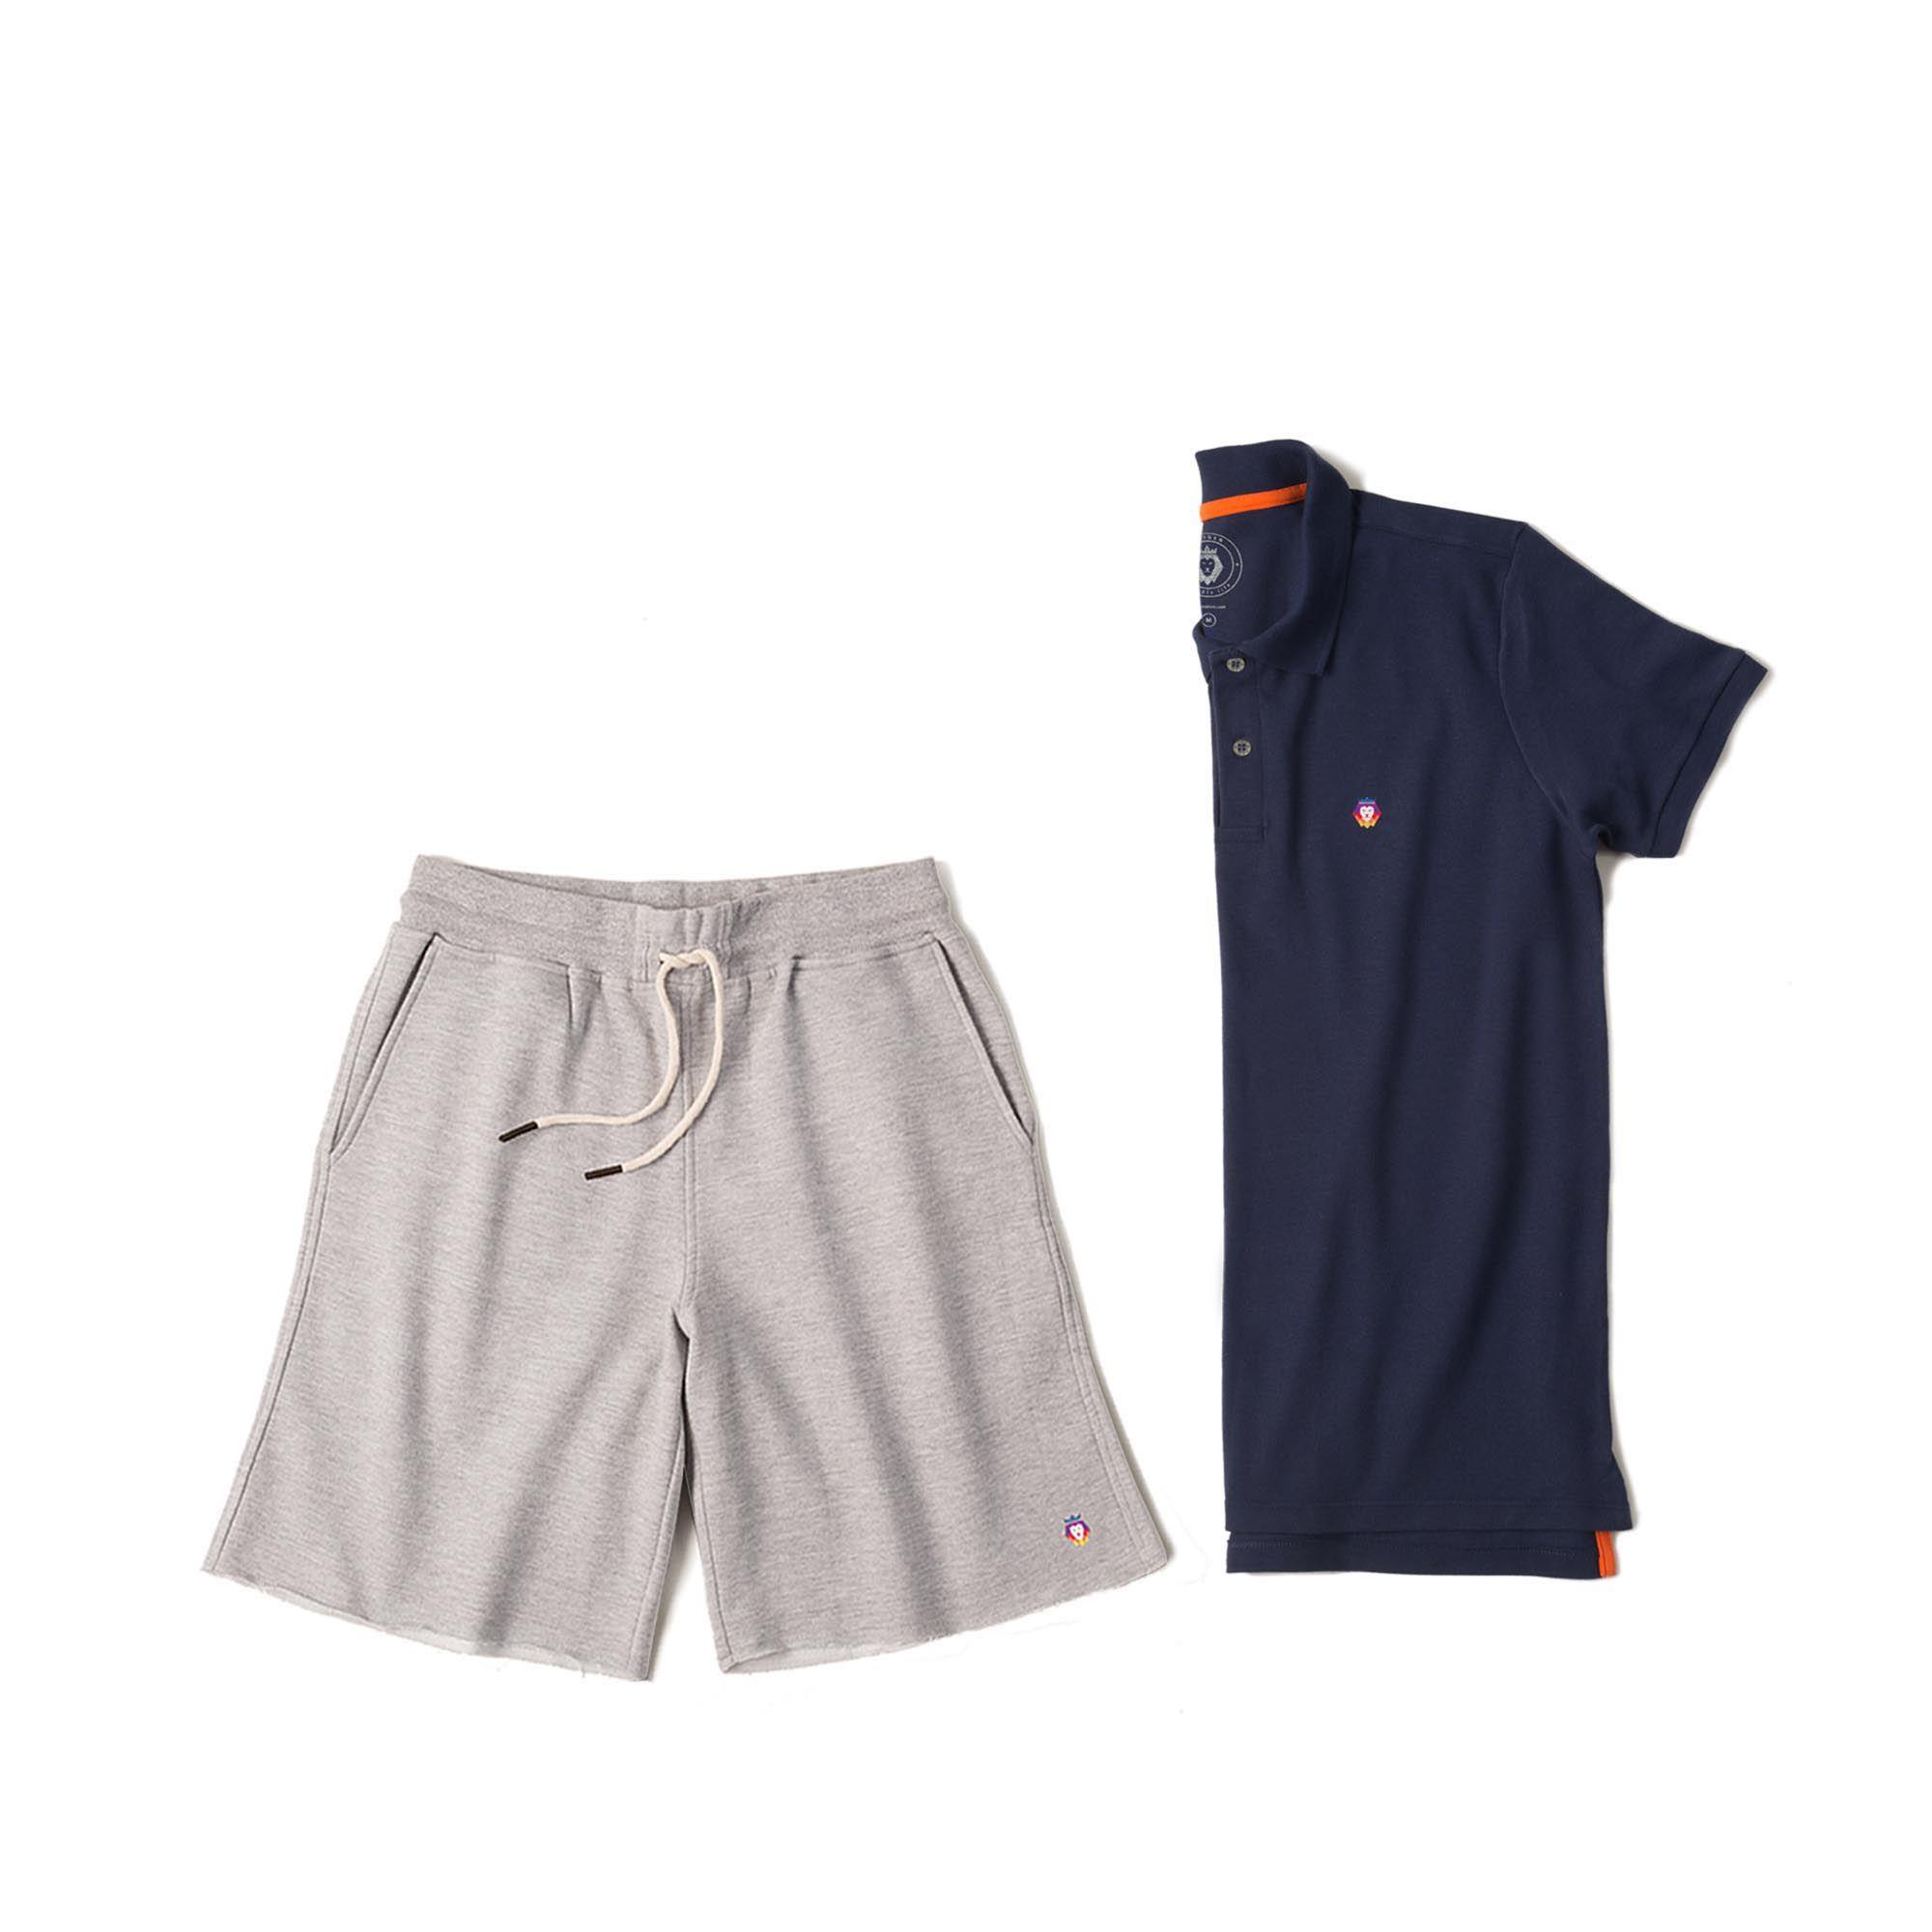 Kit 1 Bermuda Basic Mescla + 1 Camisa Polo Style Azul Marinho Zaiden Masculina